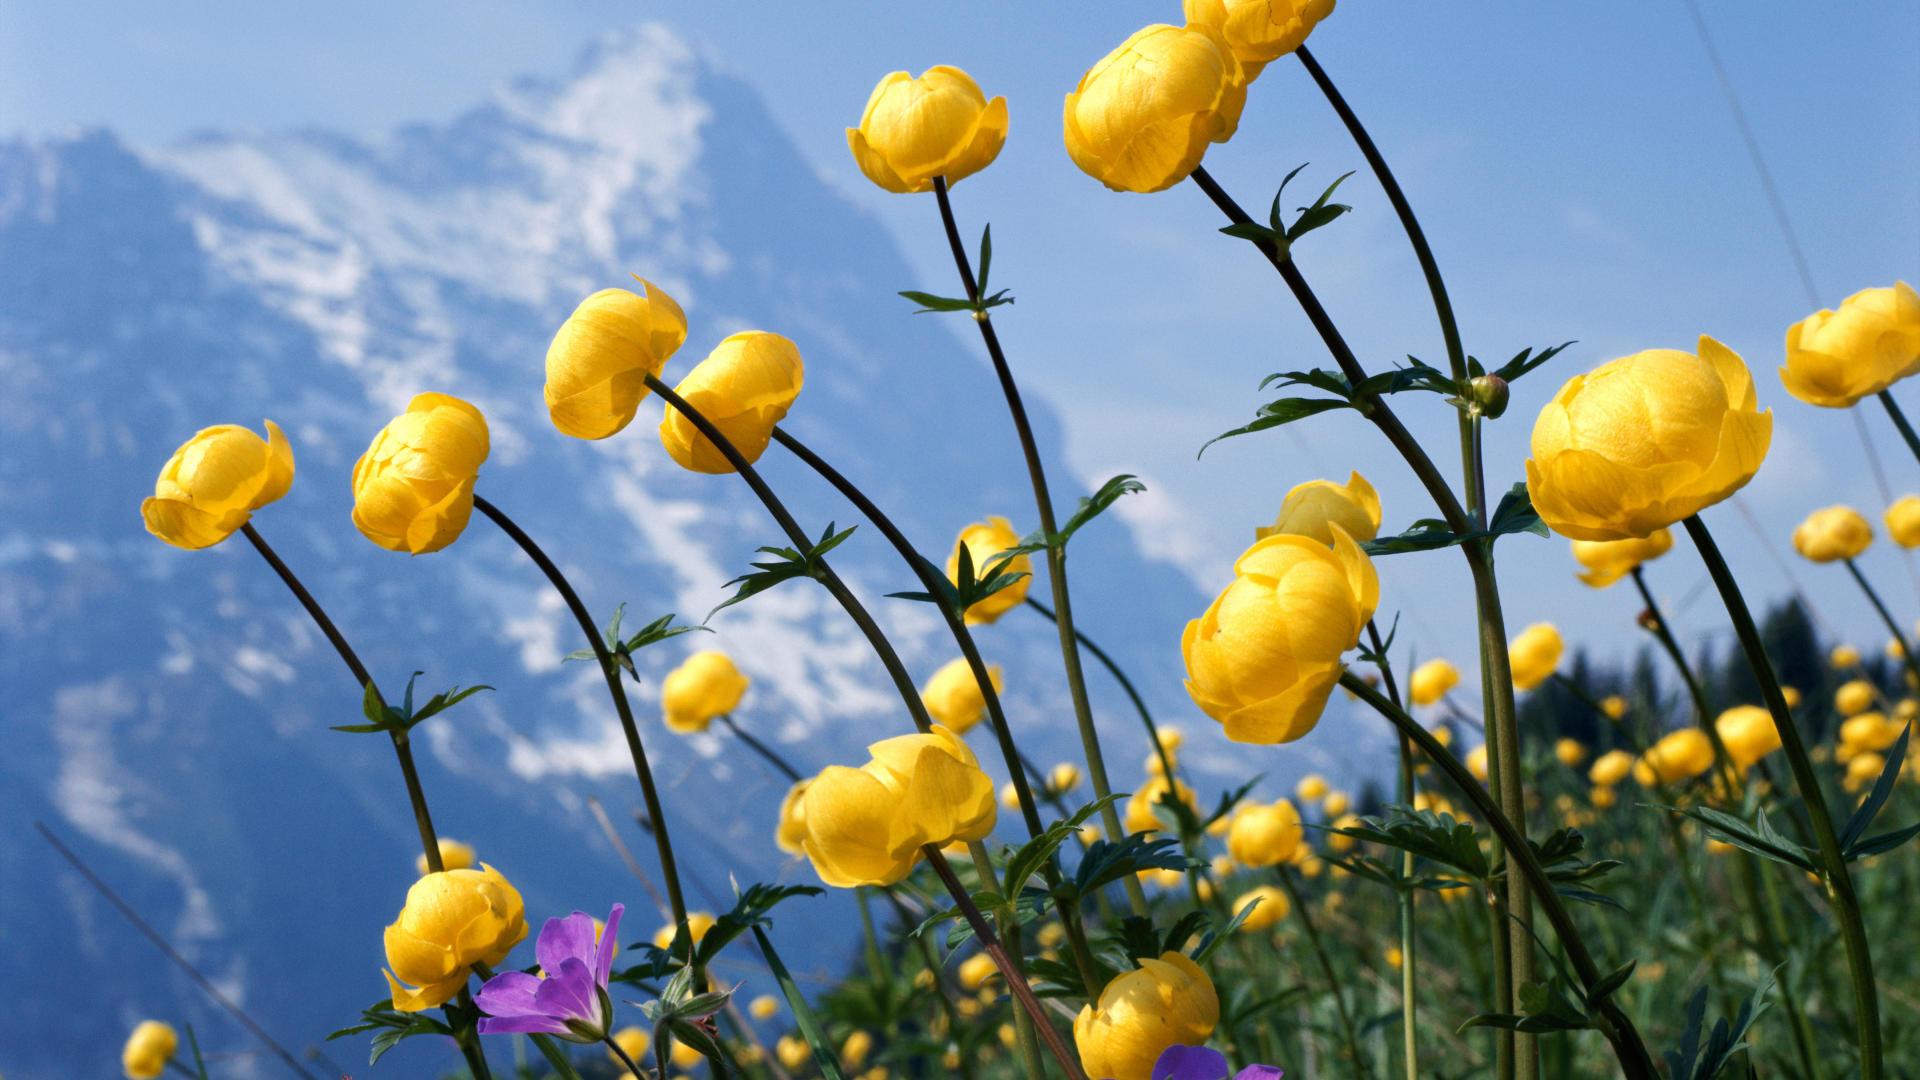 25 Free HD Flowers Wallpapers